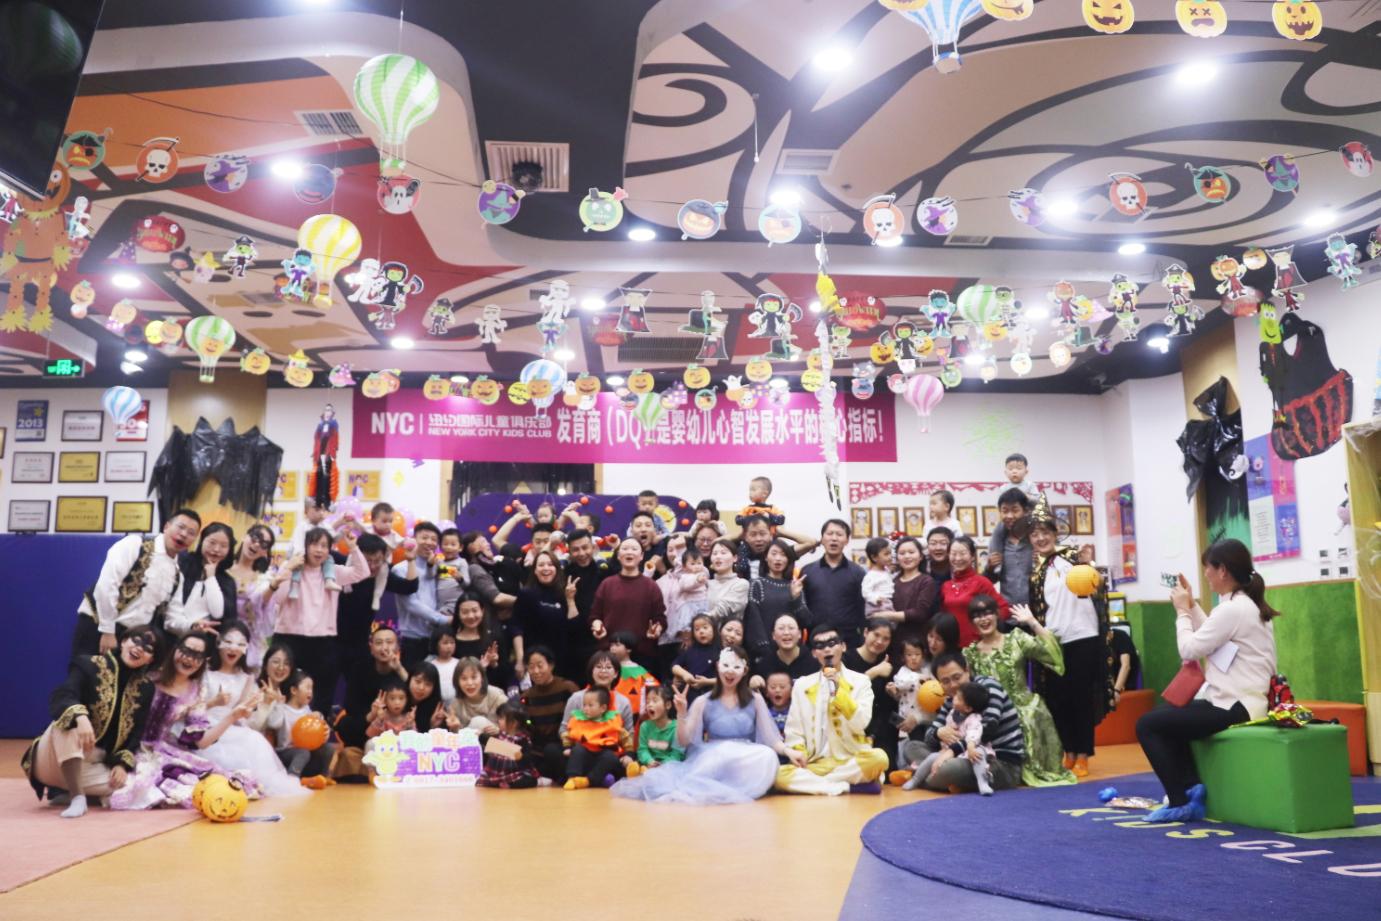 NYC纽约国际陕西宝鸡早教中心:【活动回顾】灰姑娘万圣节之夜